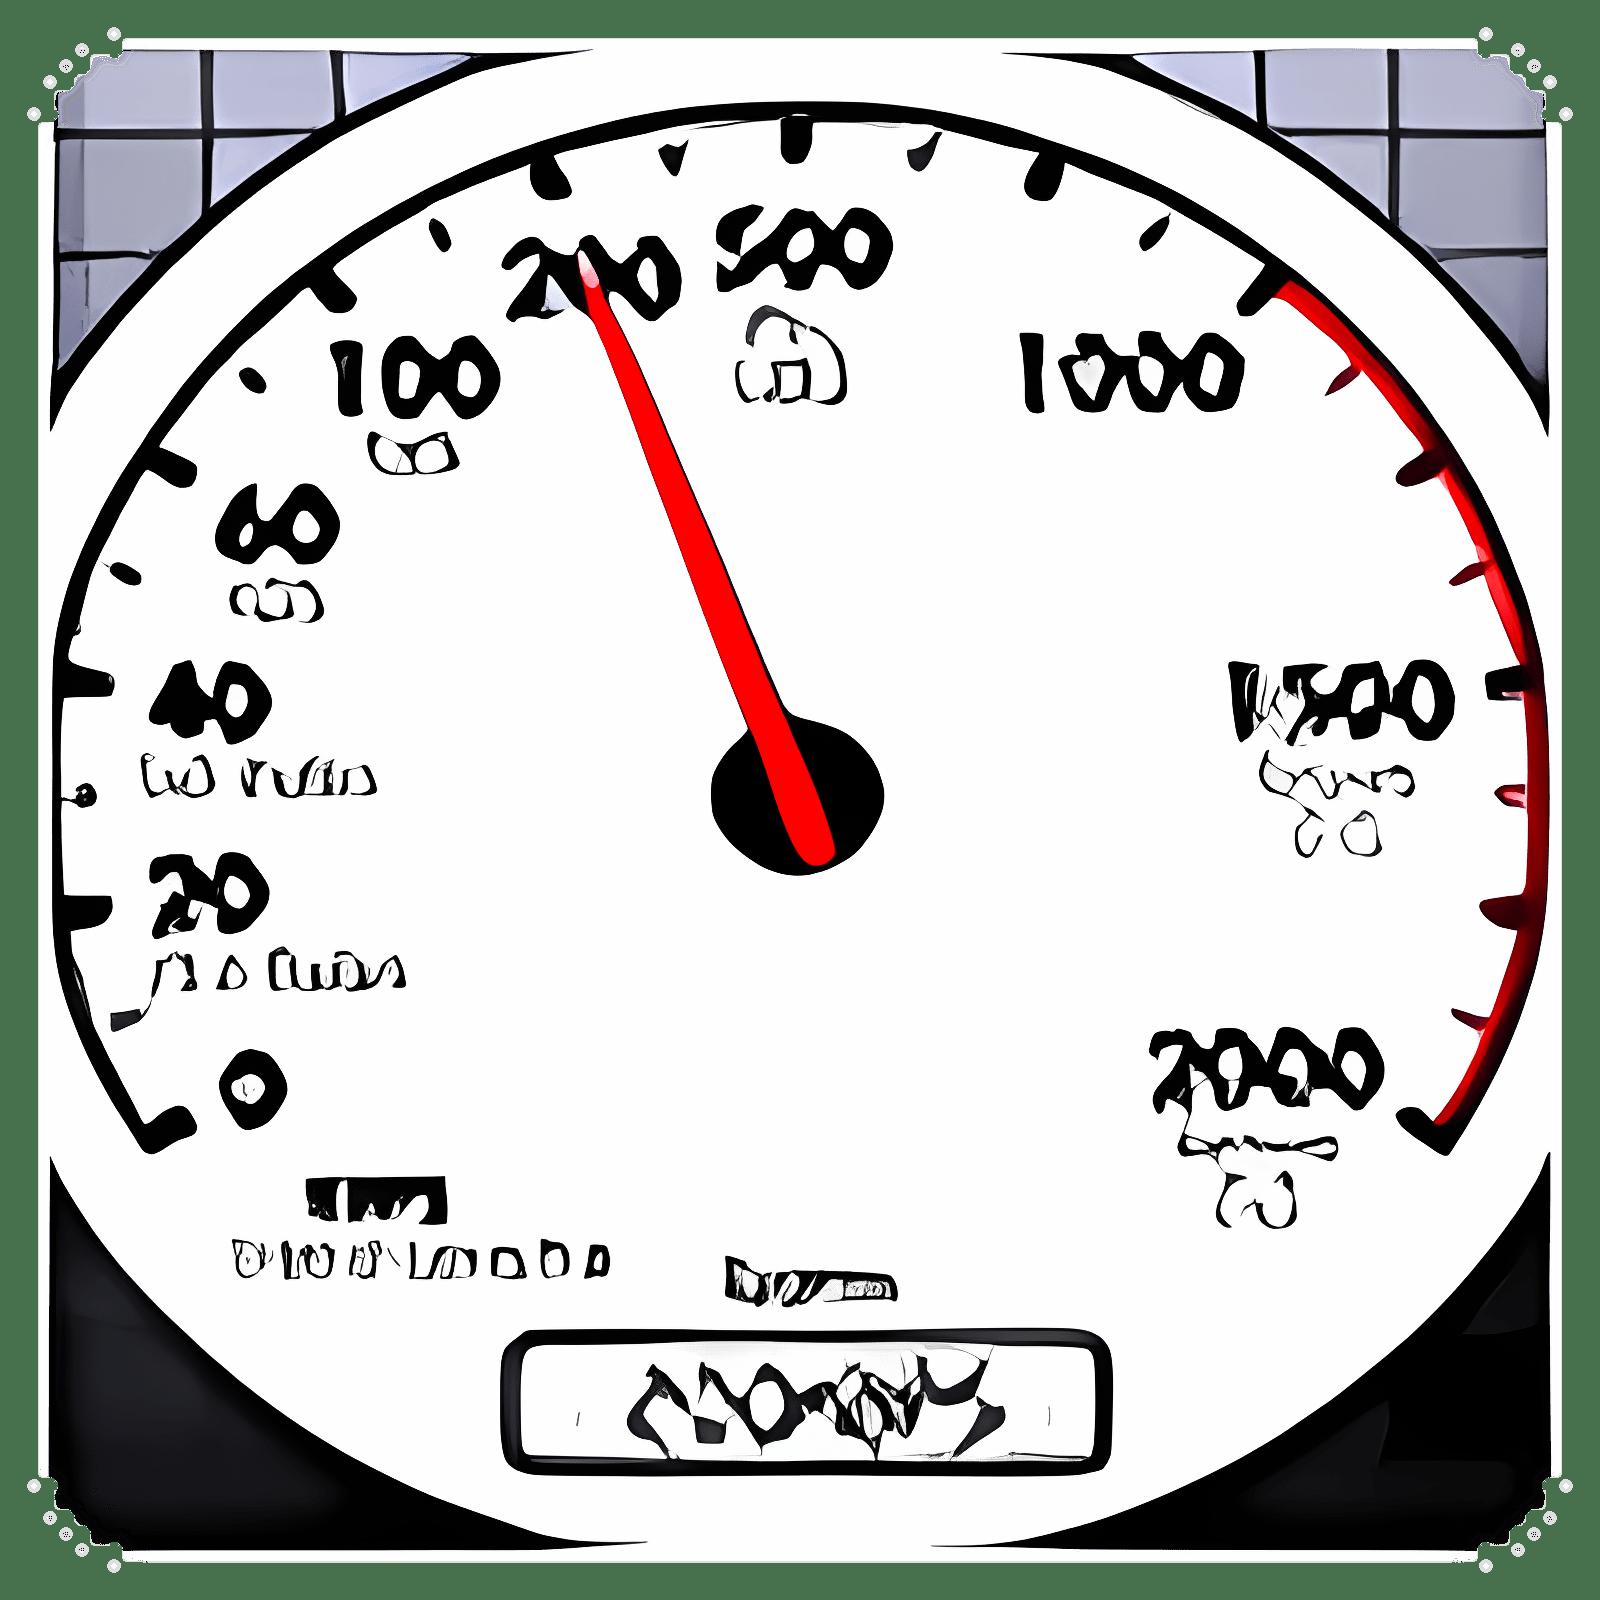 Simple Net Speed